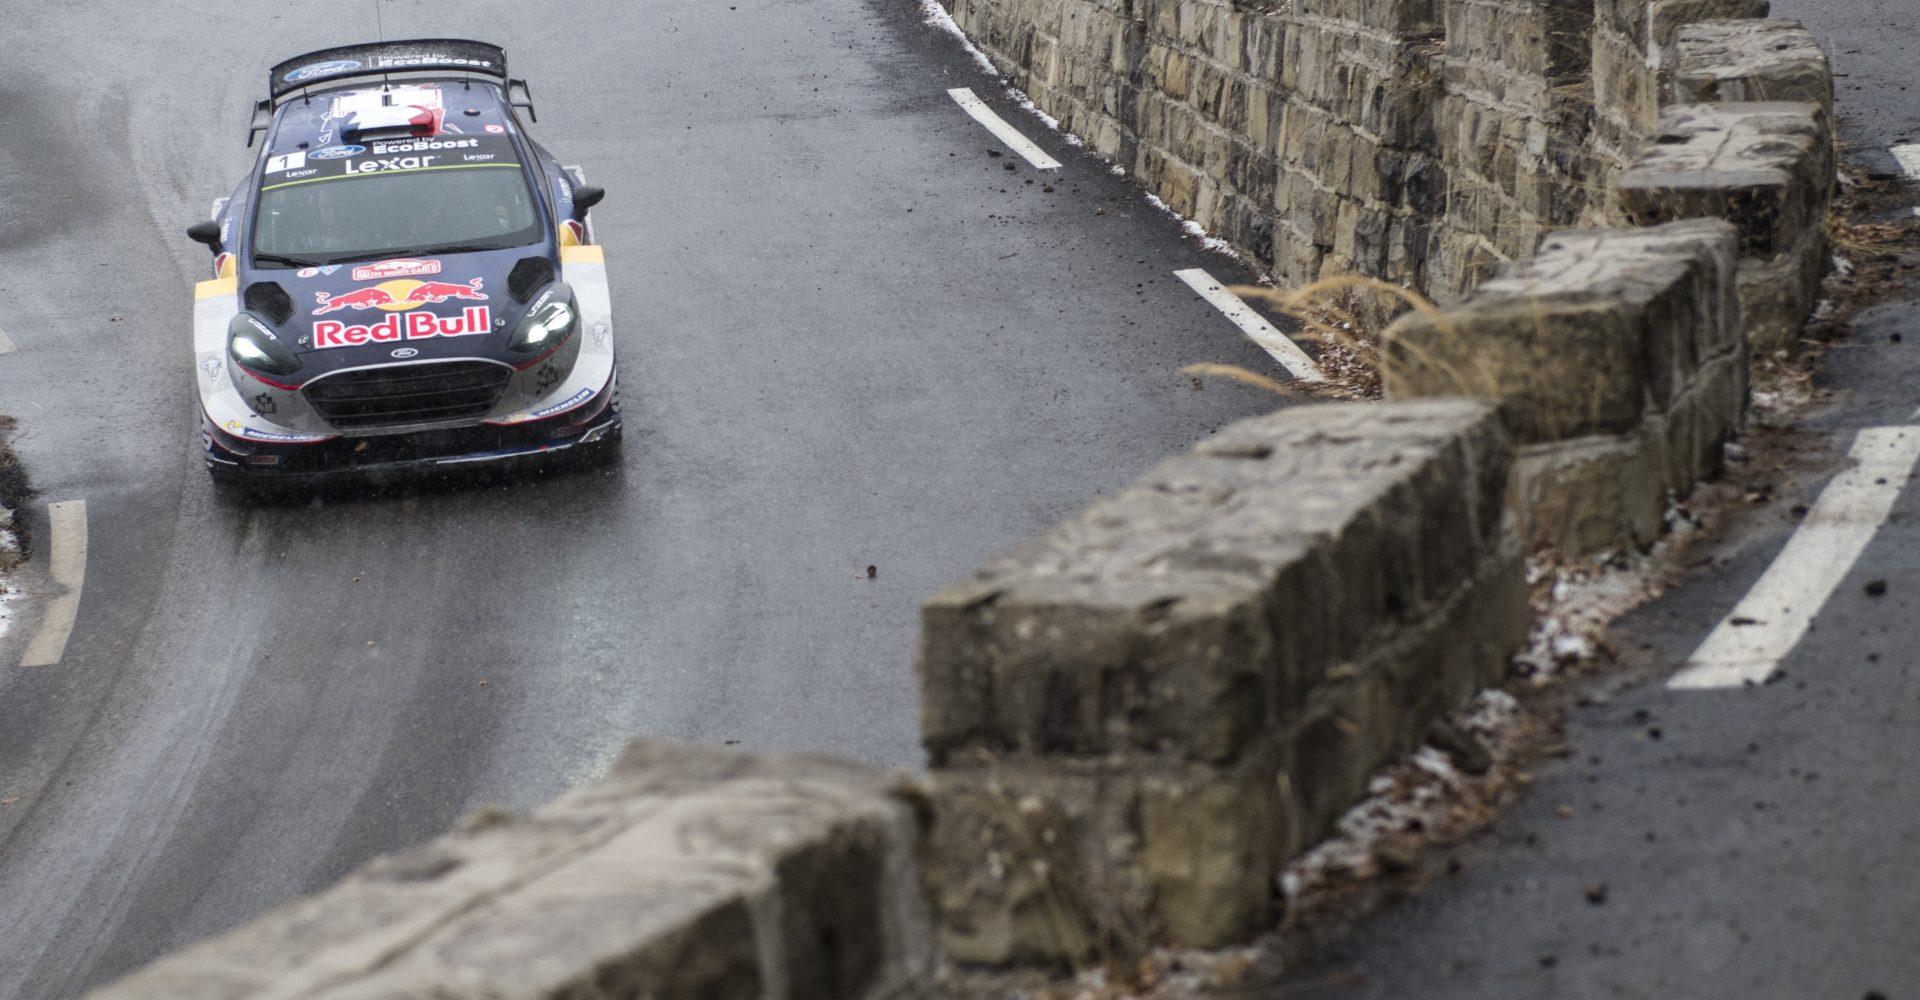 WRC Welcomes New Era But World Champion Ogier Wins Again